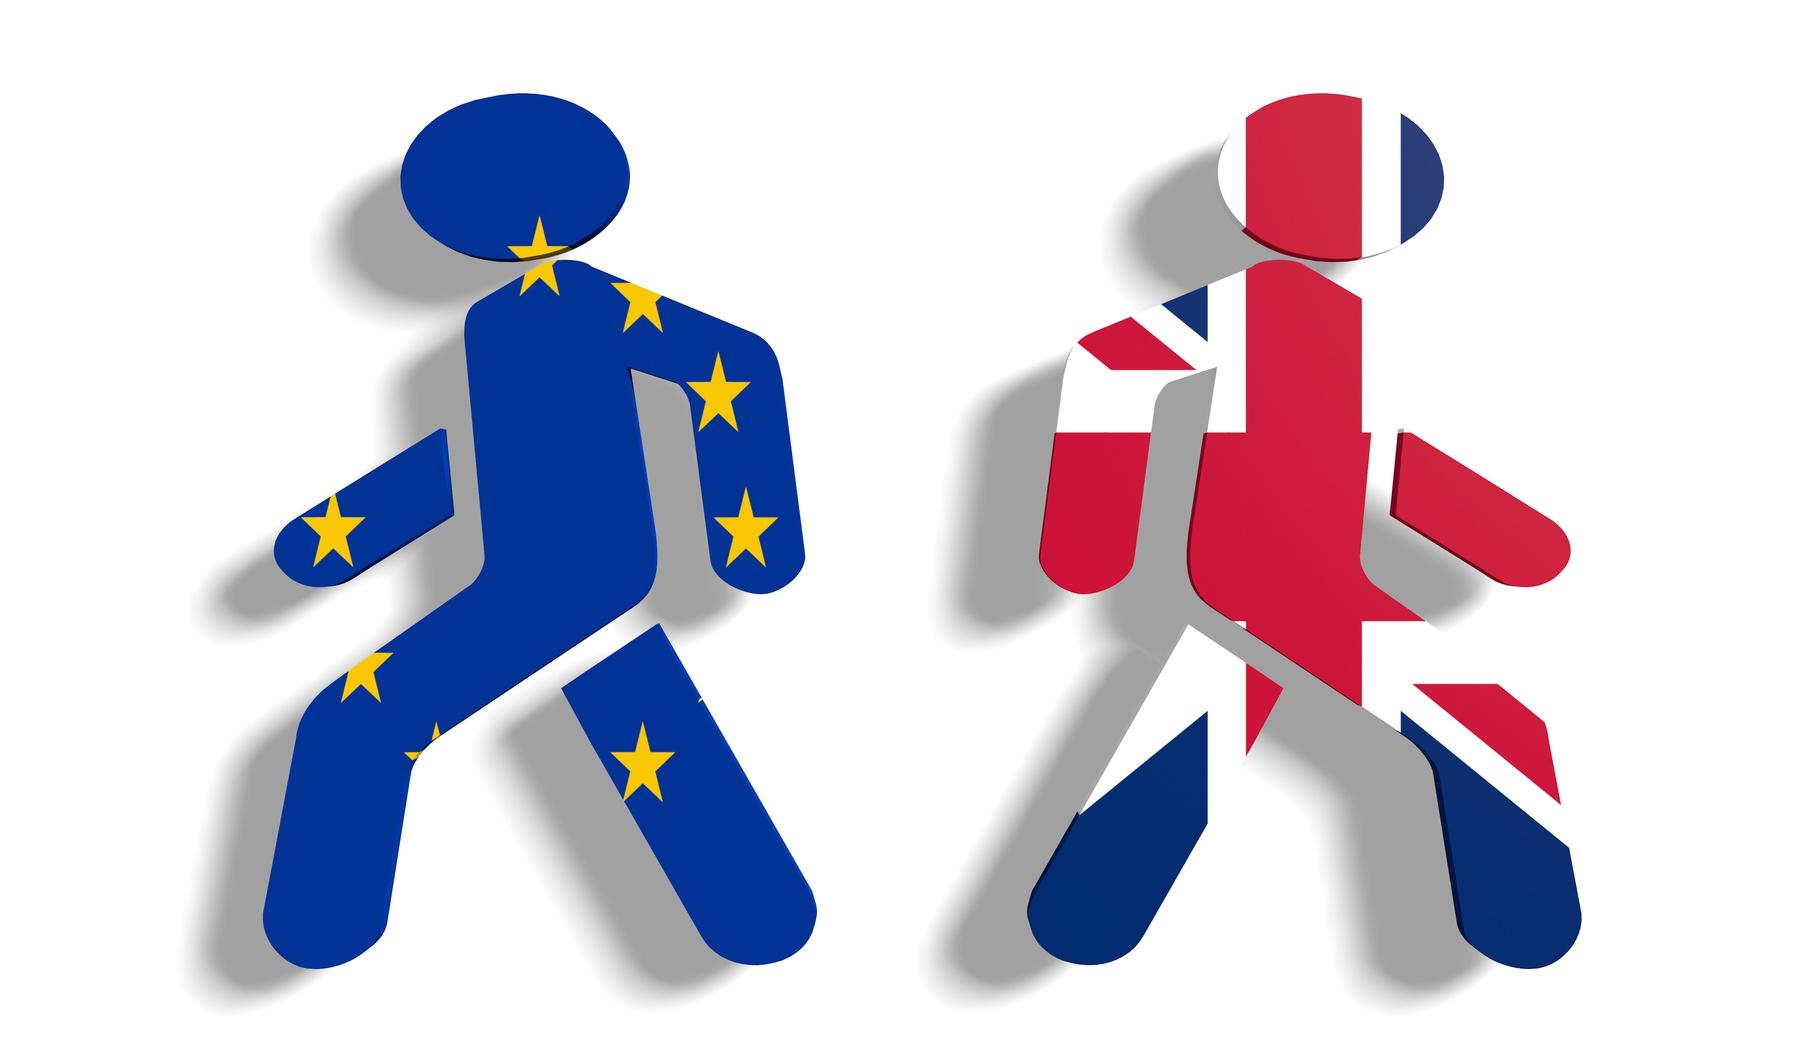 http://alexedmans.com/wp-content/uploads/2016/02/Brexit.jpg